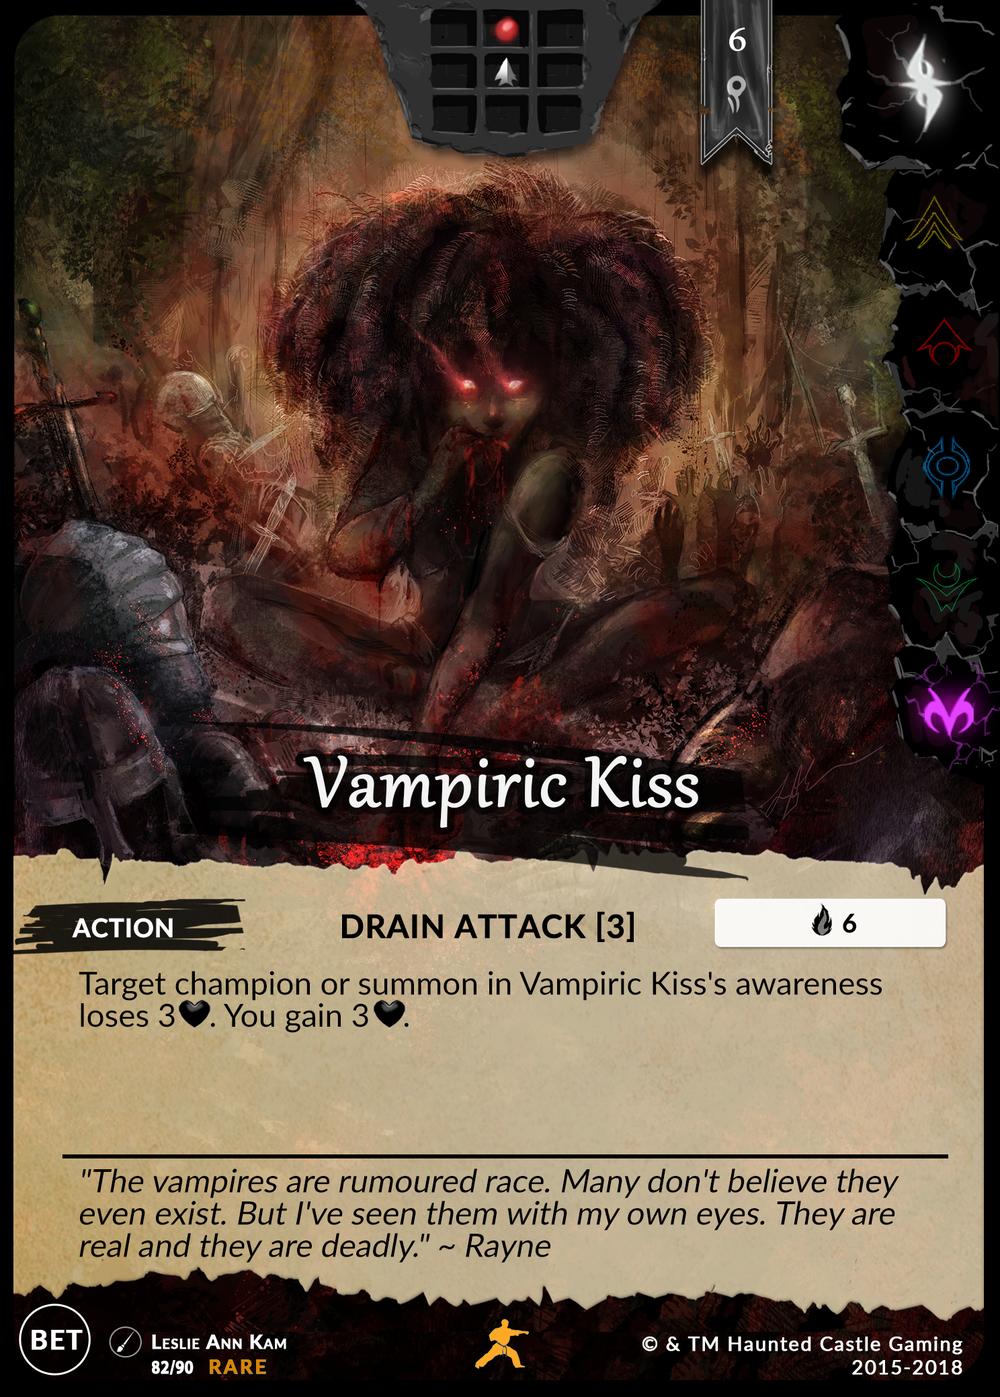 82-Vampiric Kiss-Trimmed.png